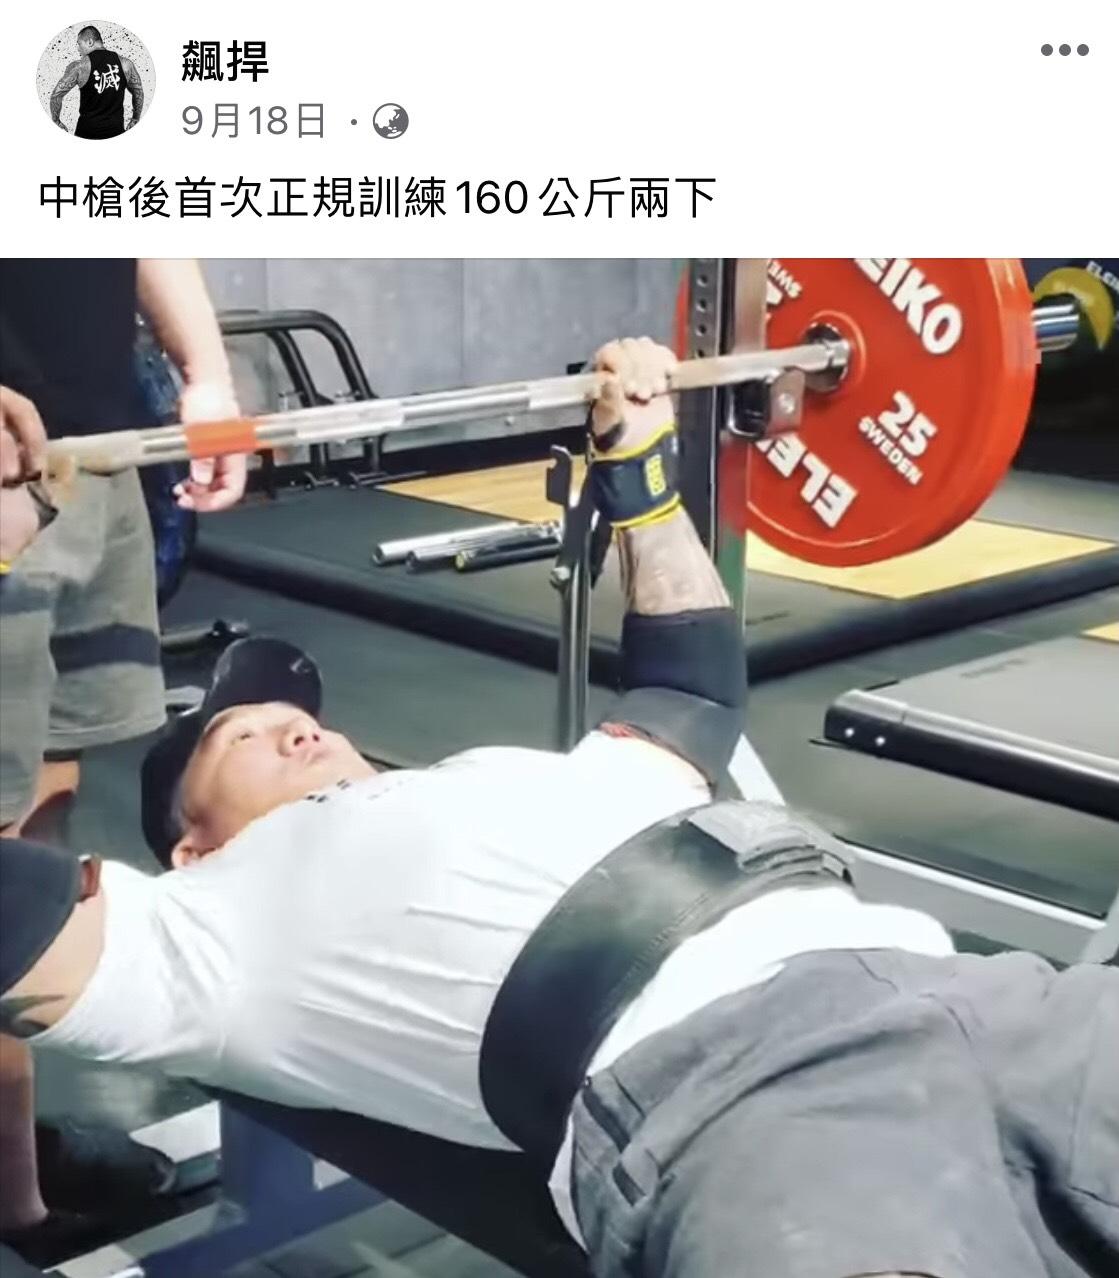 圖片來源/館長FB